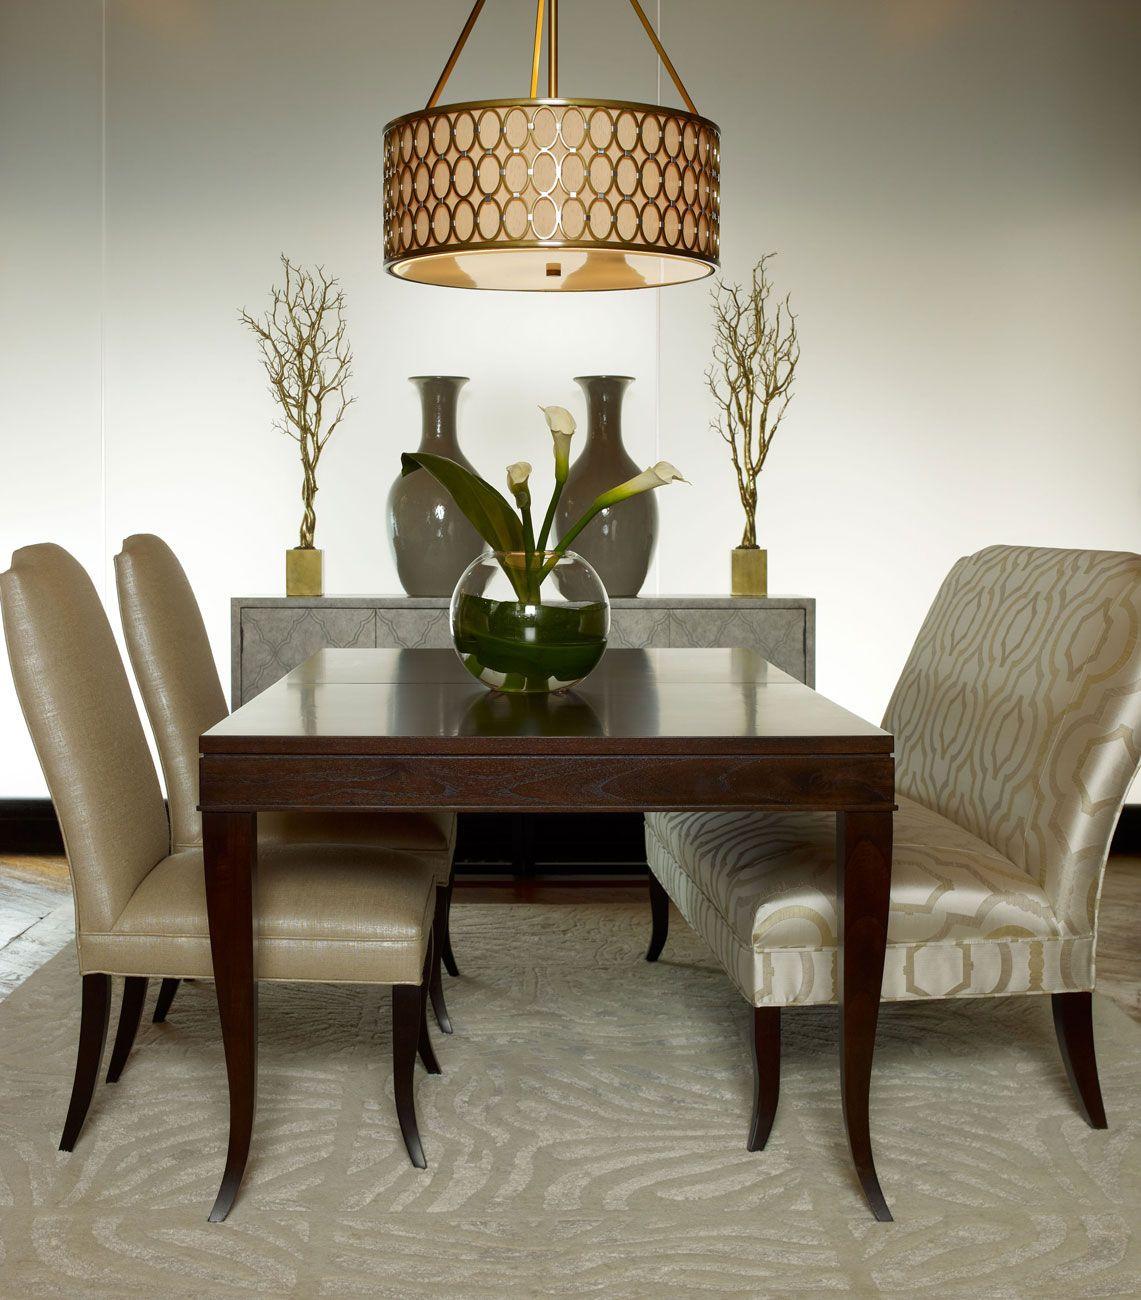 Dining room design 2013 - Candice Olson Furniture 2013 Candice Olson S Dining Room Collection